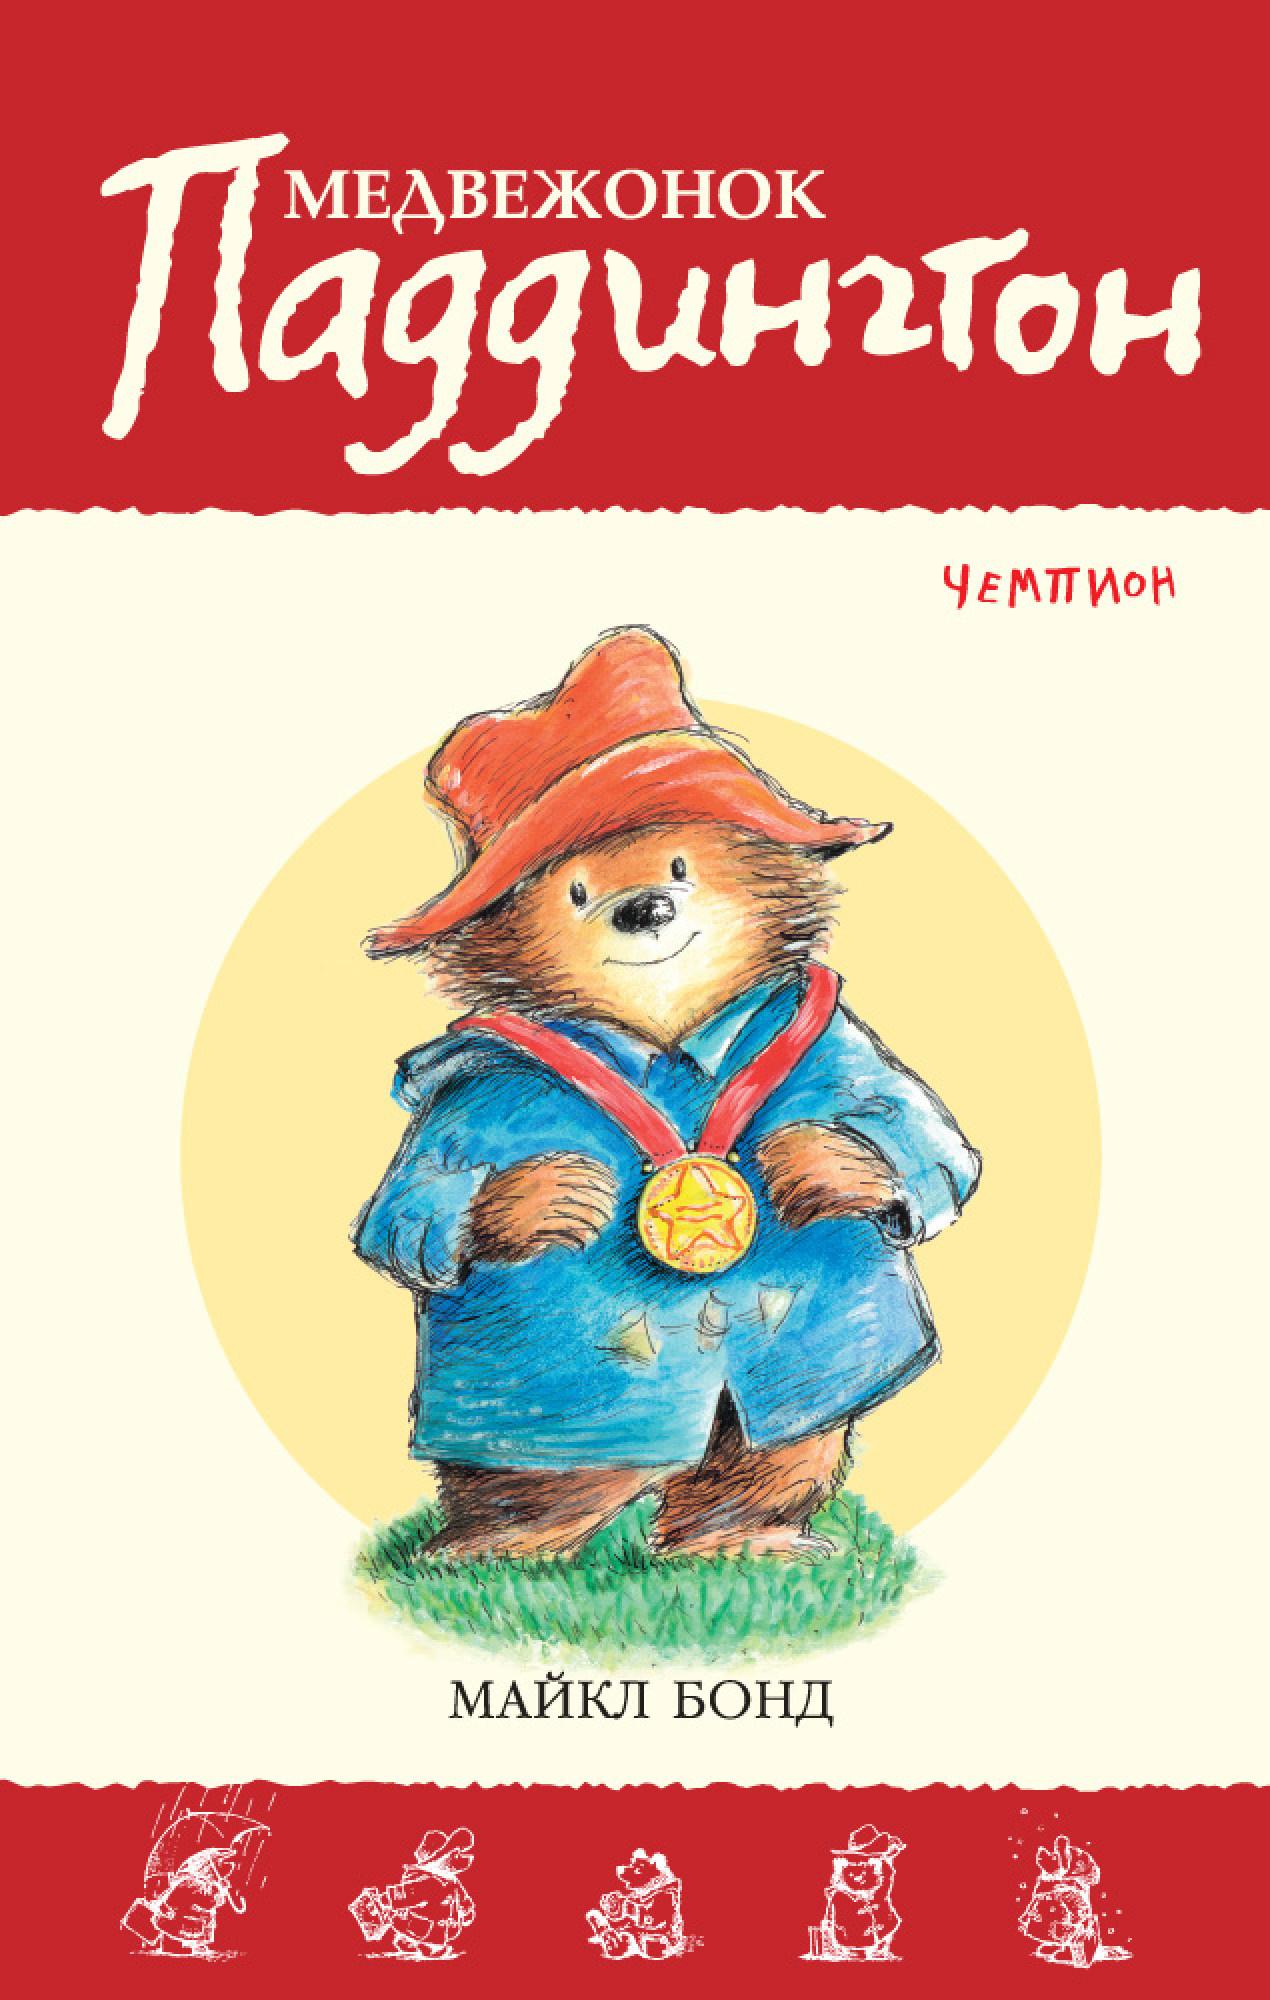 Медвежонок Паддингтон — чемпион